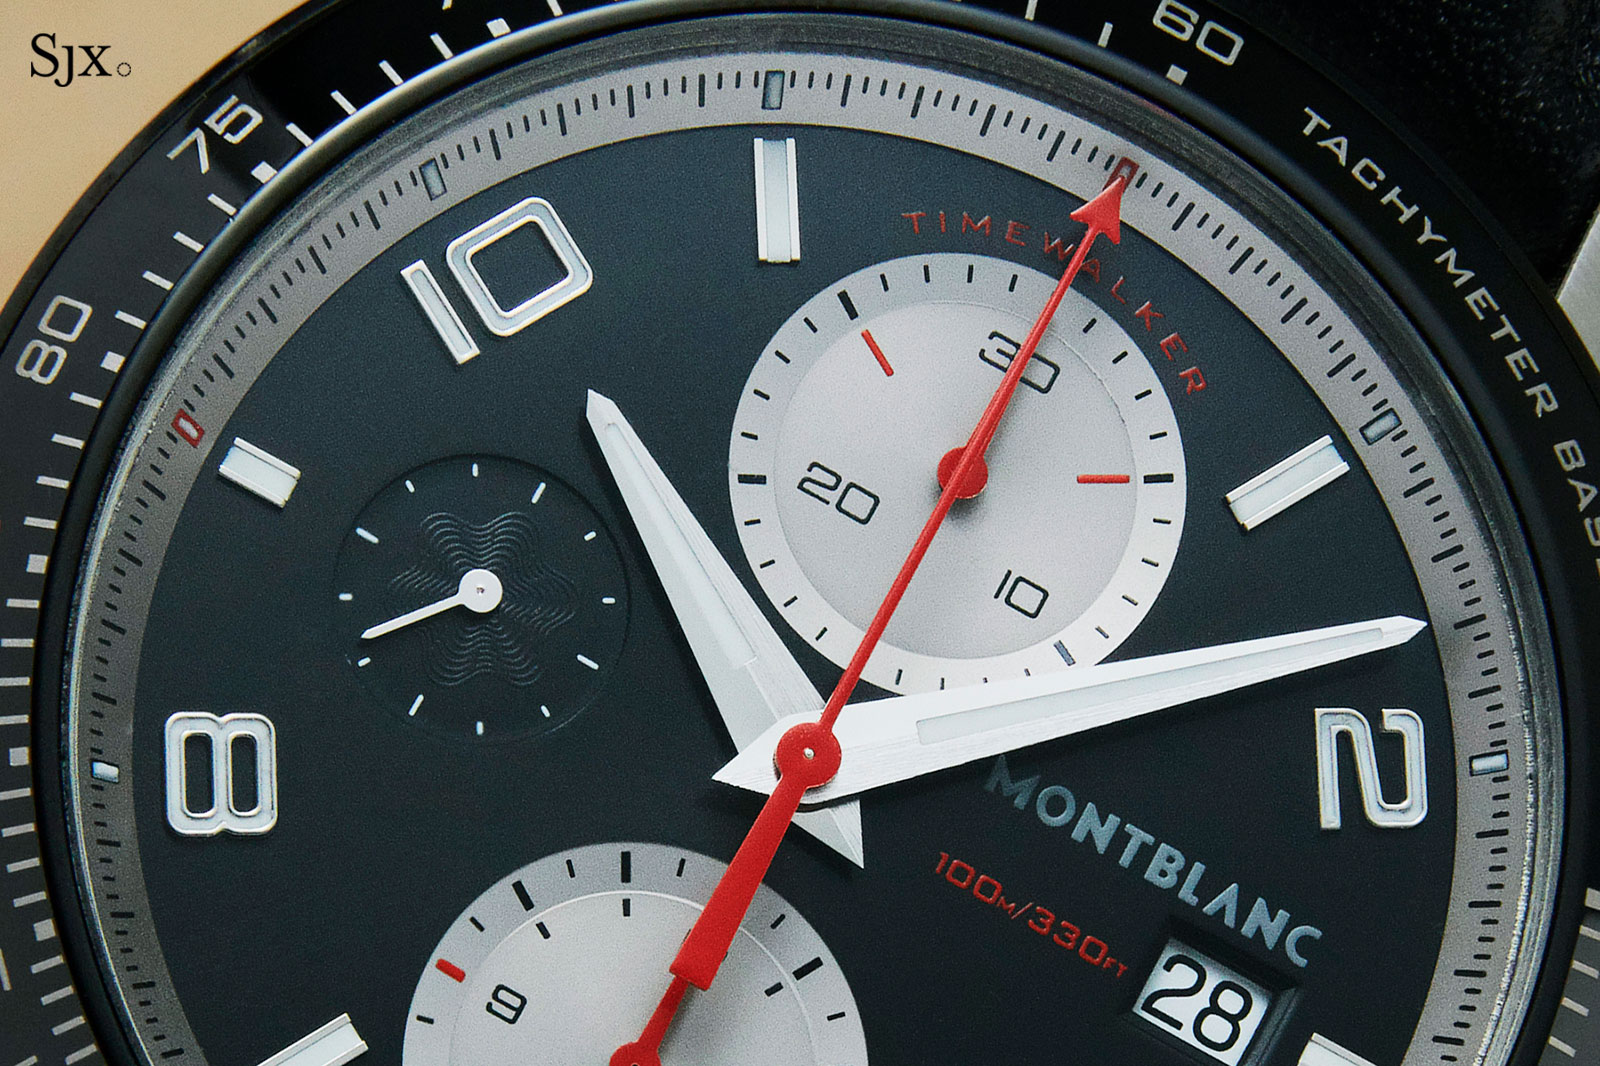 Montblanc TimeWalker Chronograph reverse panda